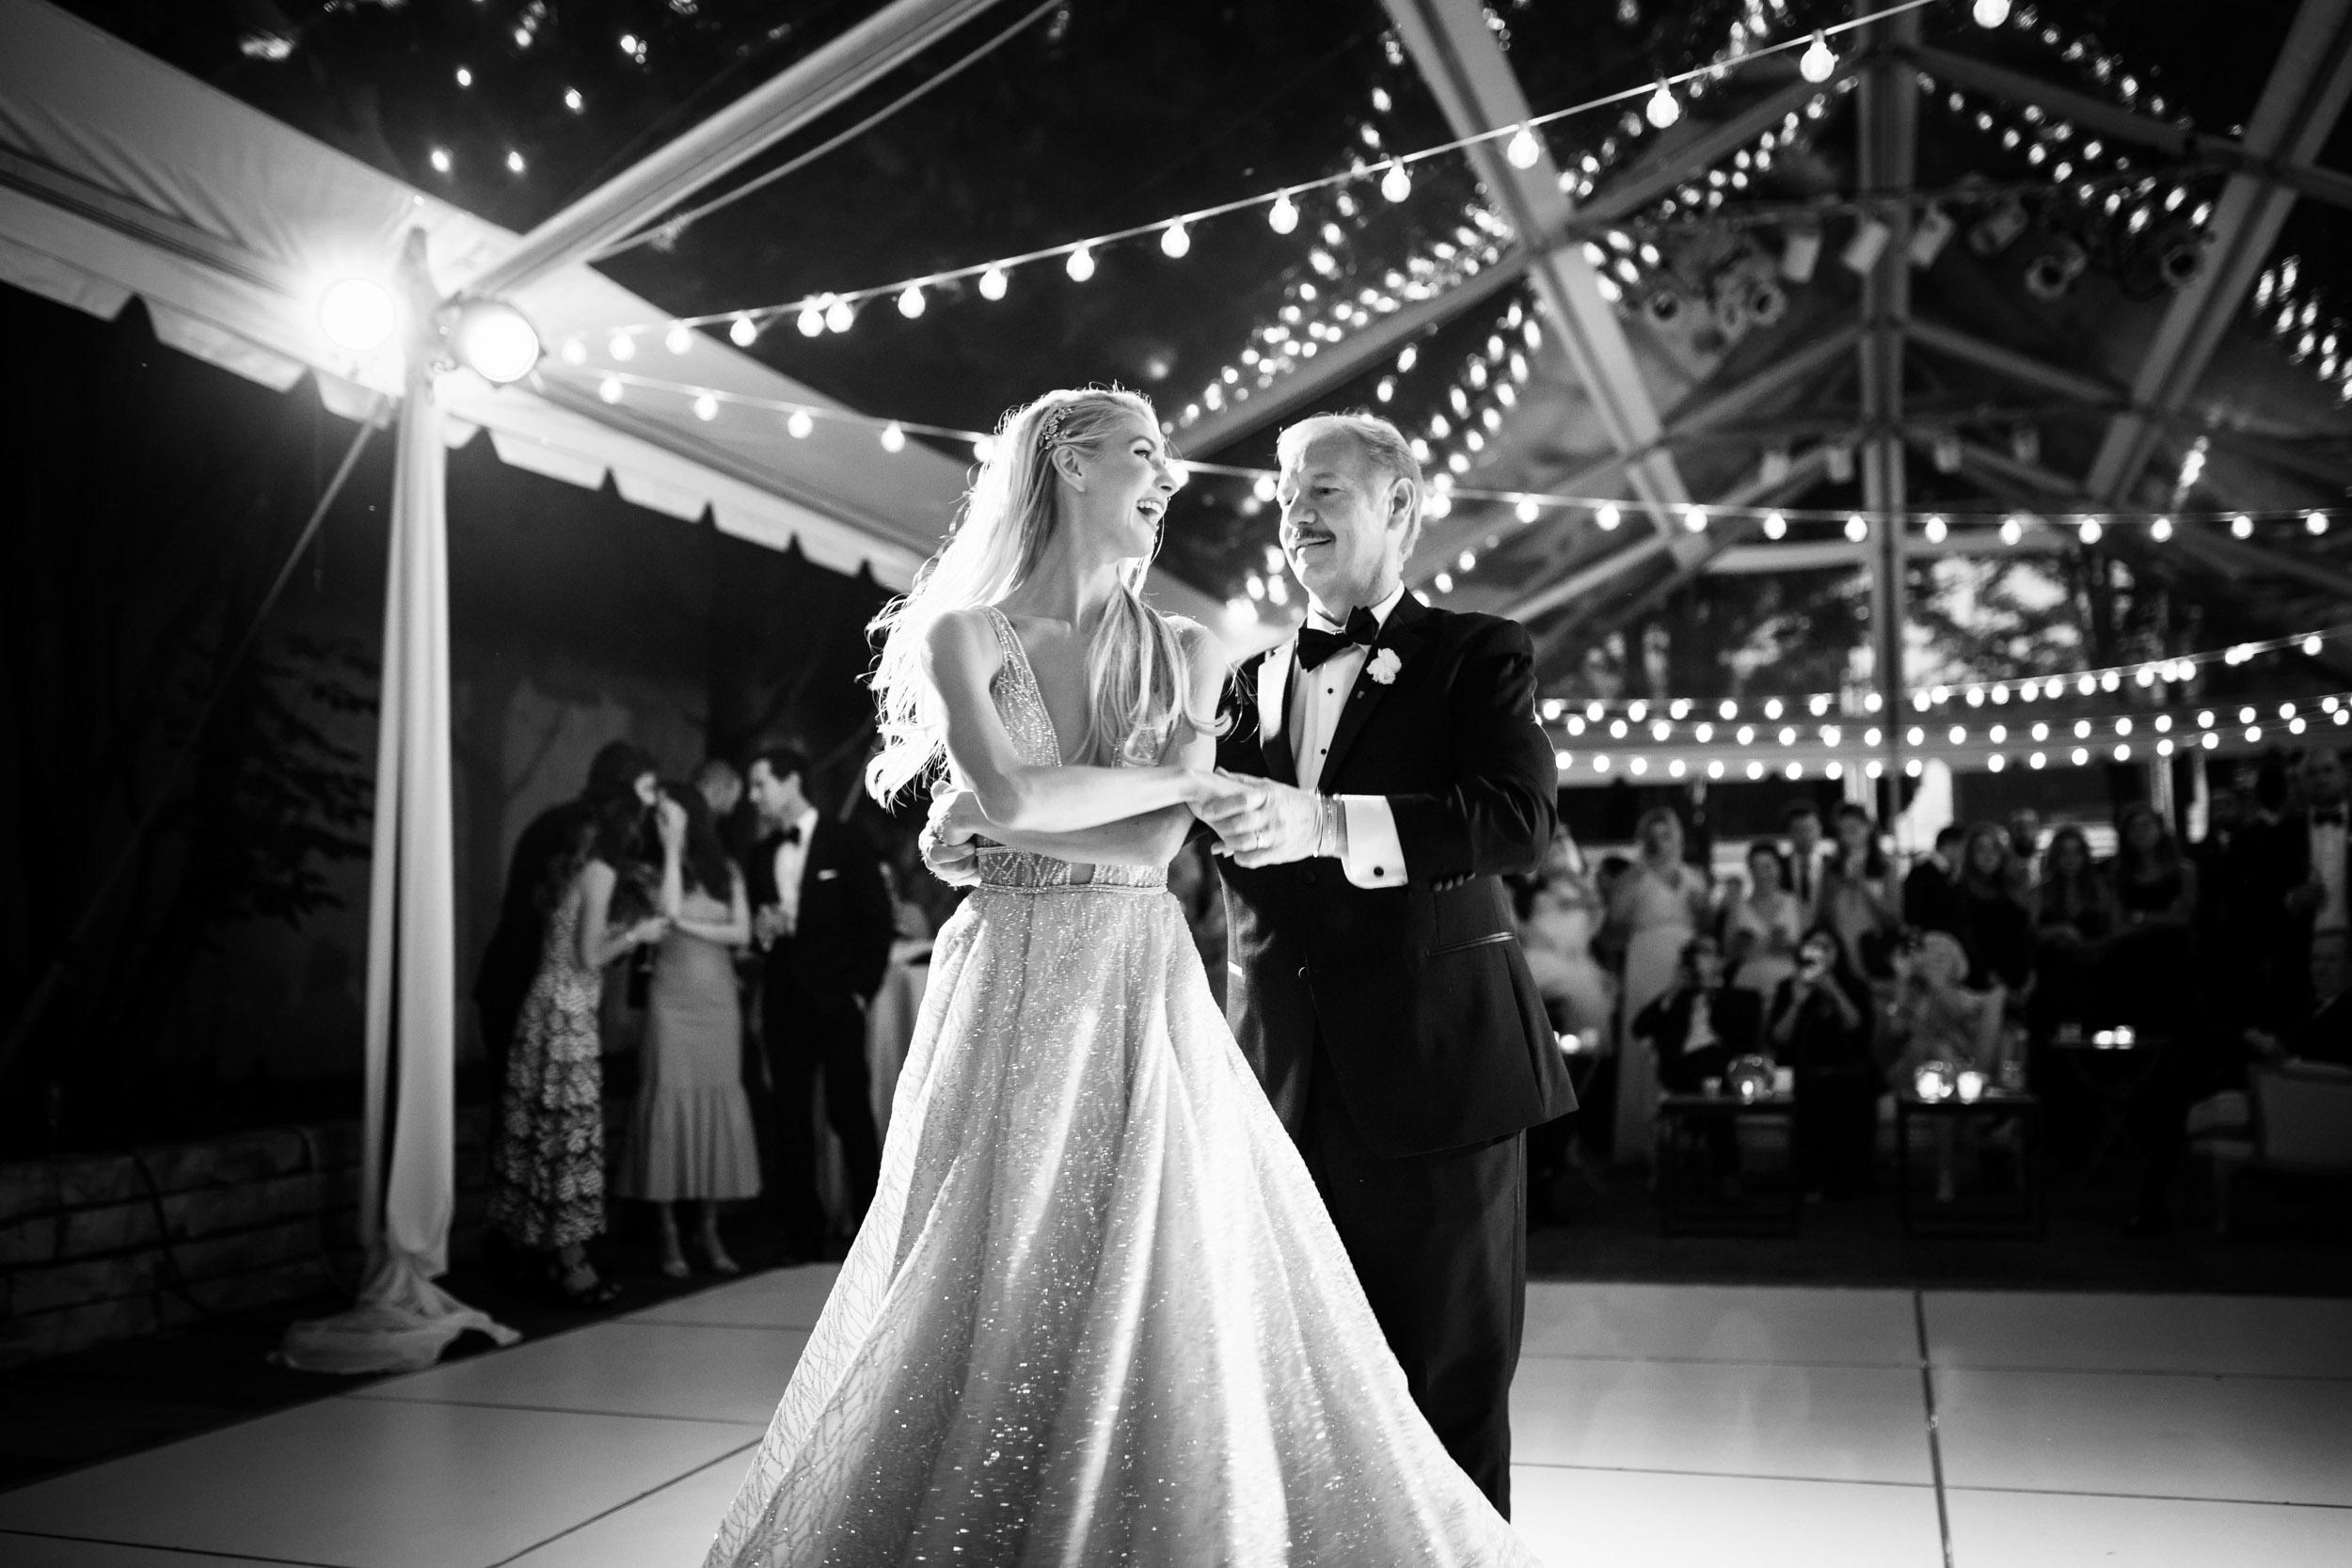 chicago-illuminating-co-wedding-photos-70.jpg